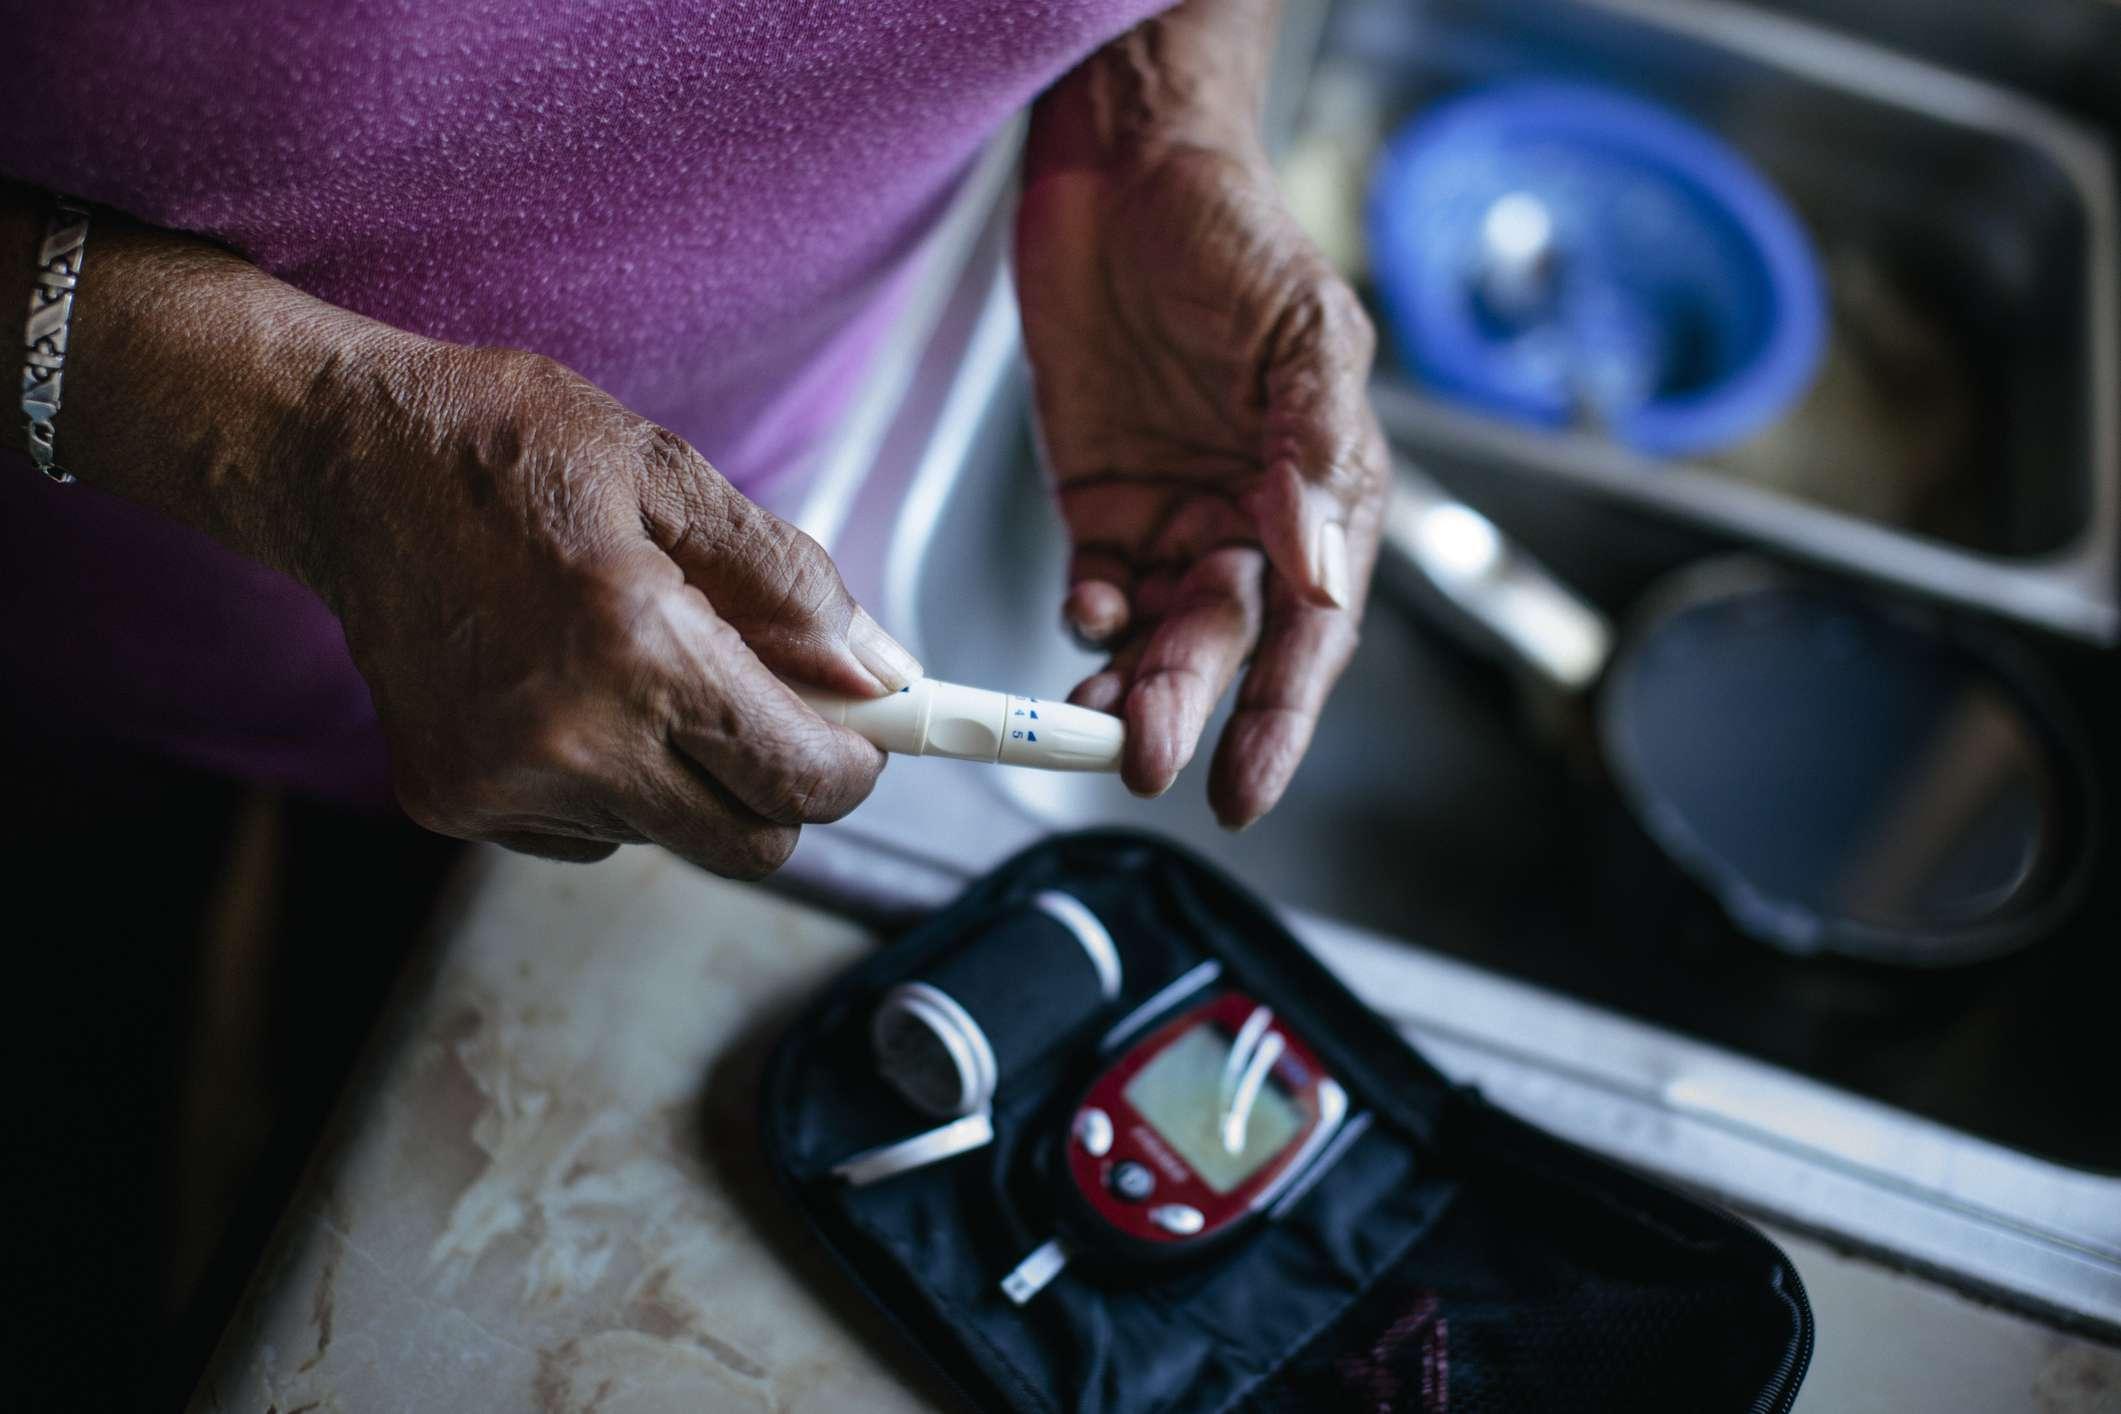 Woman checks blood sugar levels